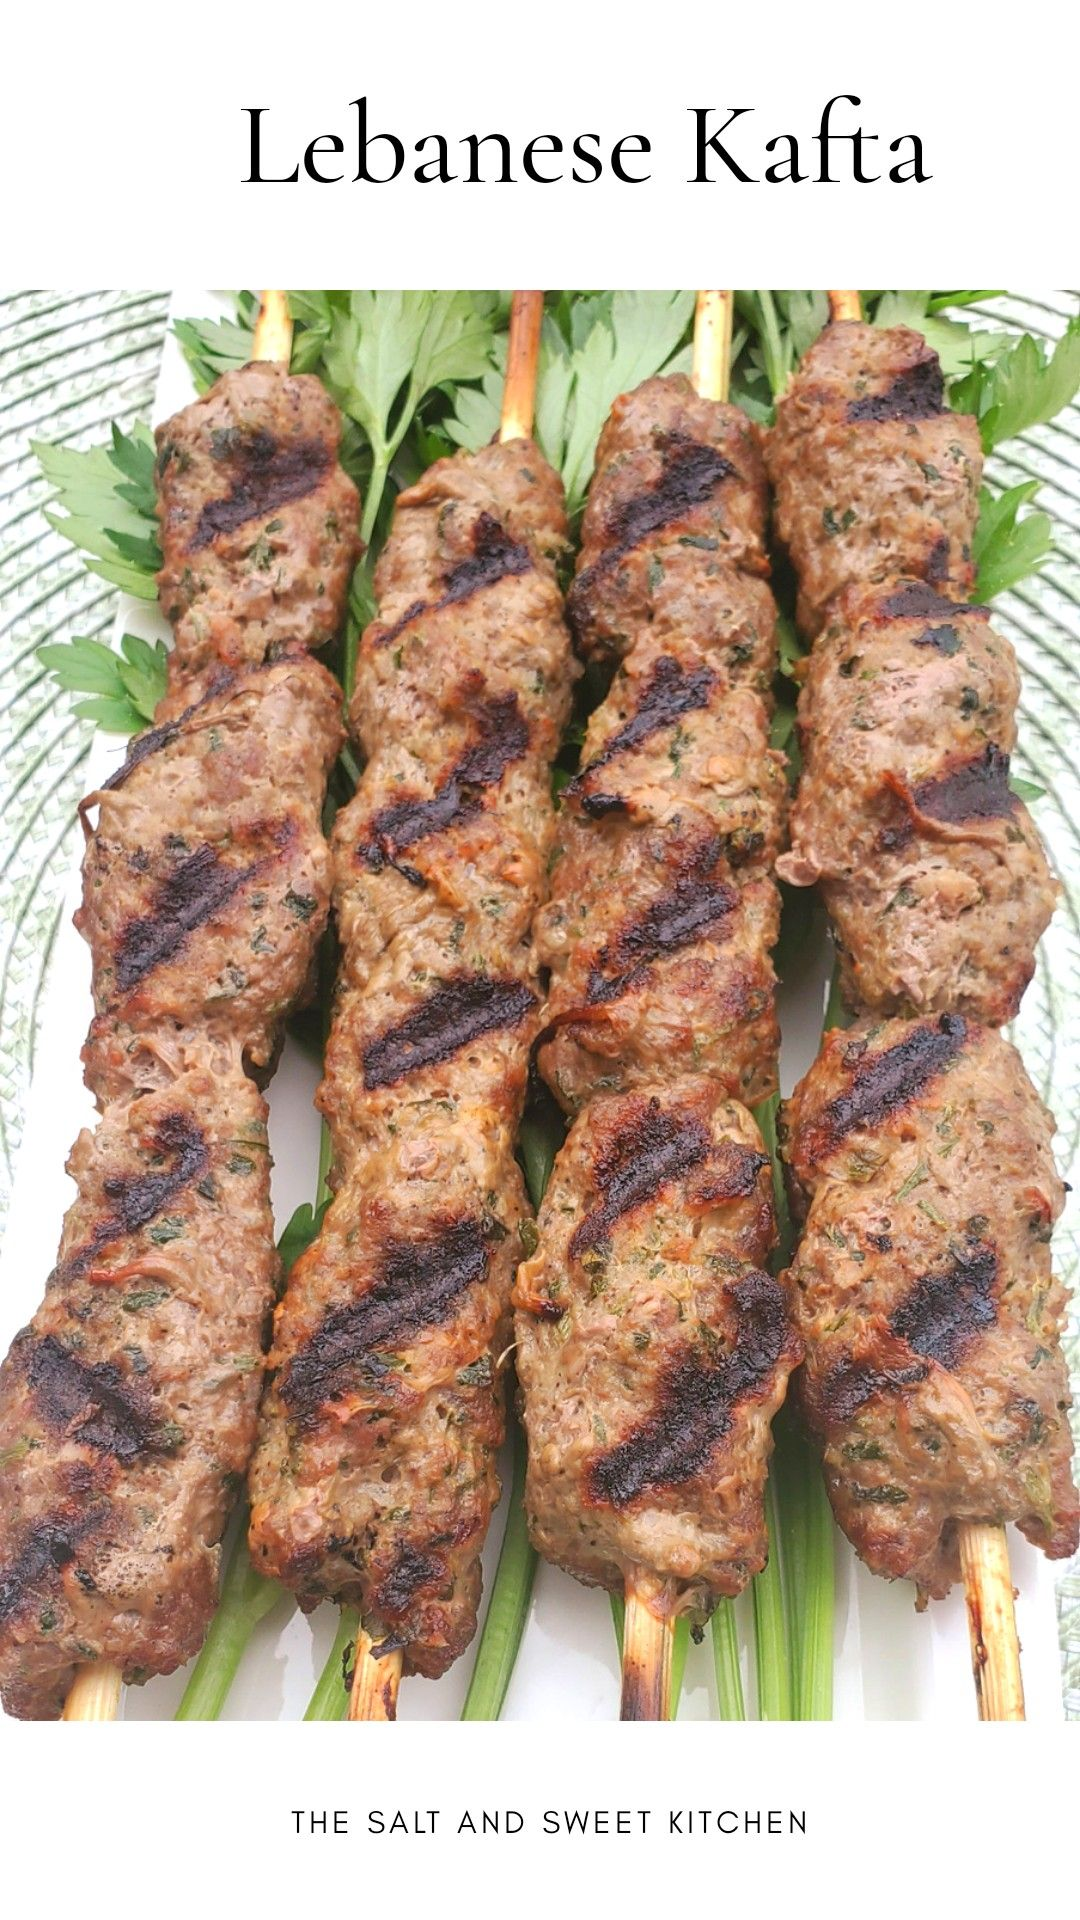 Kafta Kabob Lebanese The Salt And Sweet Kitchen Recipe In 2020 Kafta Kabob Recipe Good Healthy Recipes Kabob Recipes